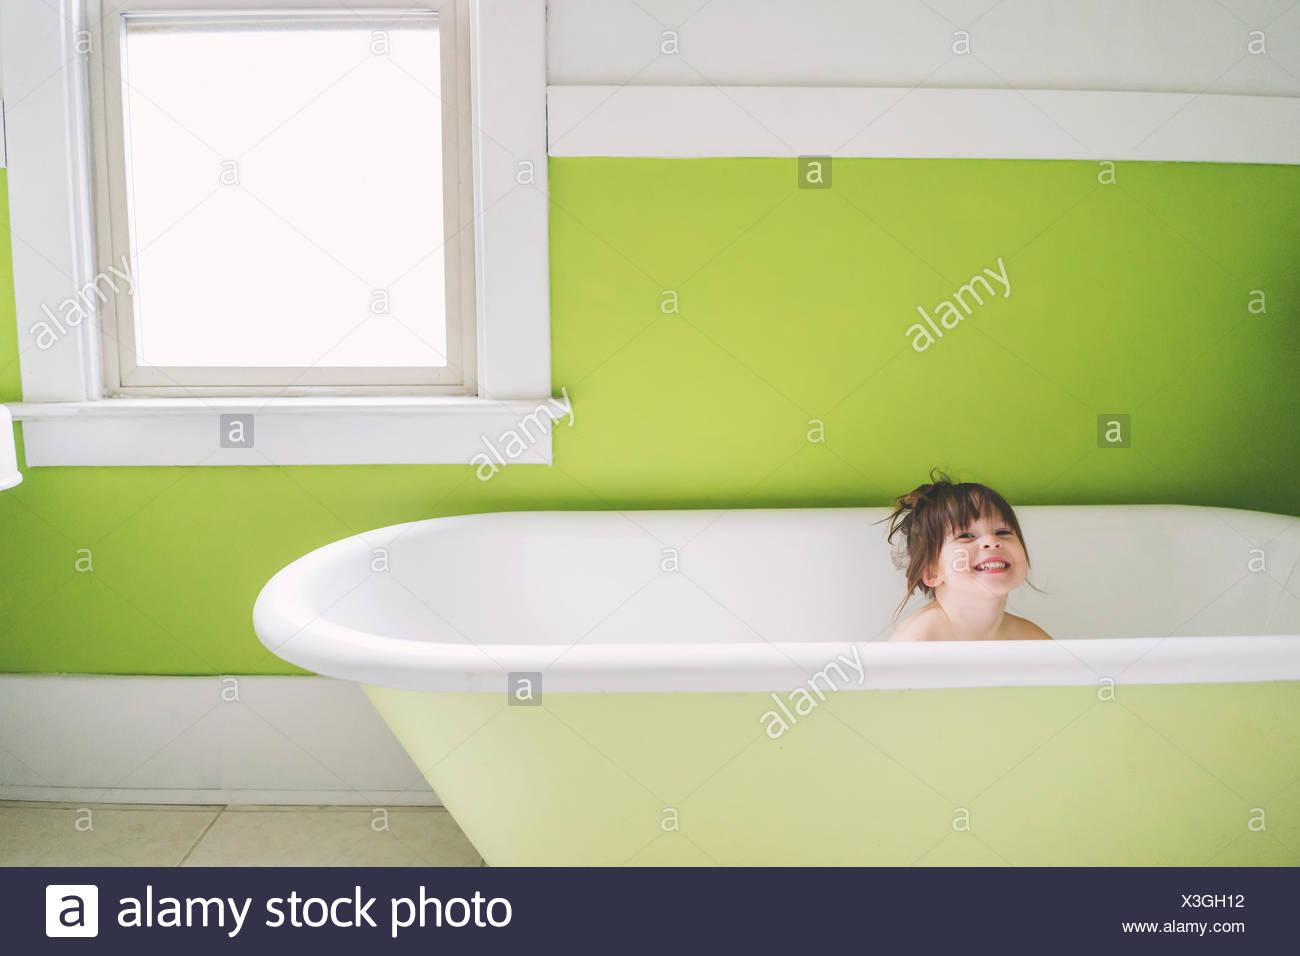 Vasca Da Bagno Seduta : Vasca da bagno con seduta trendmetr